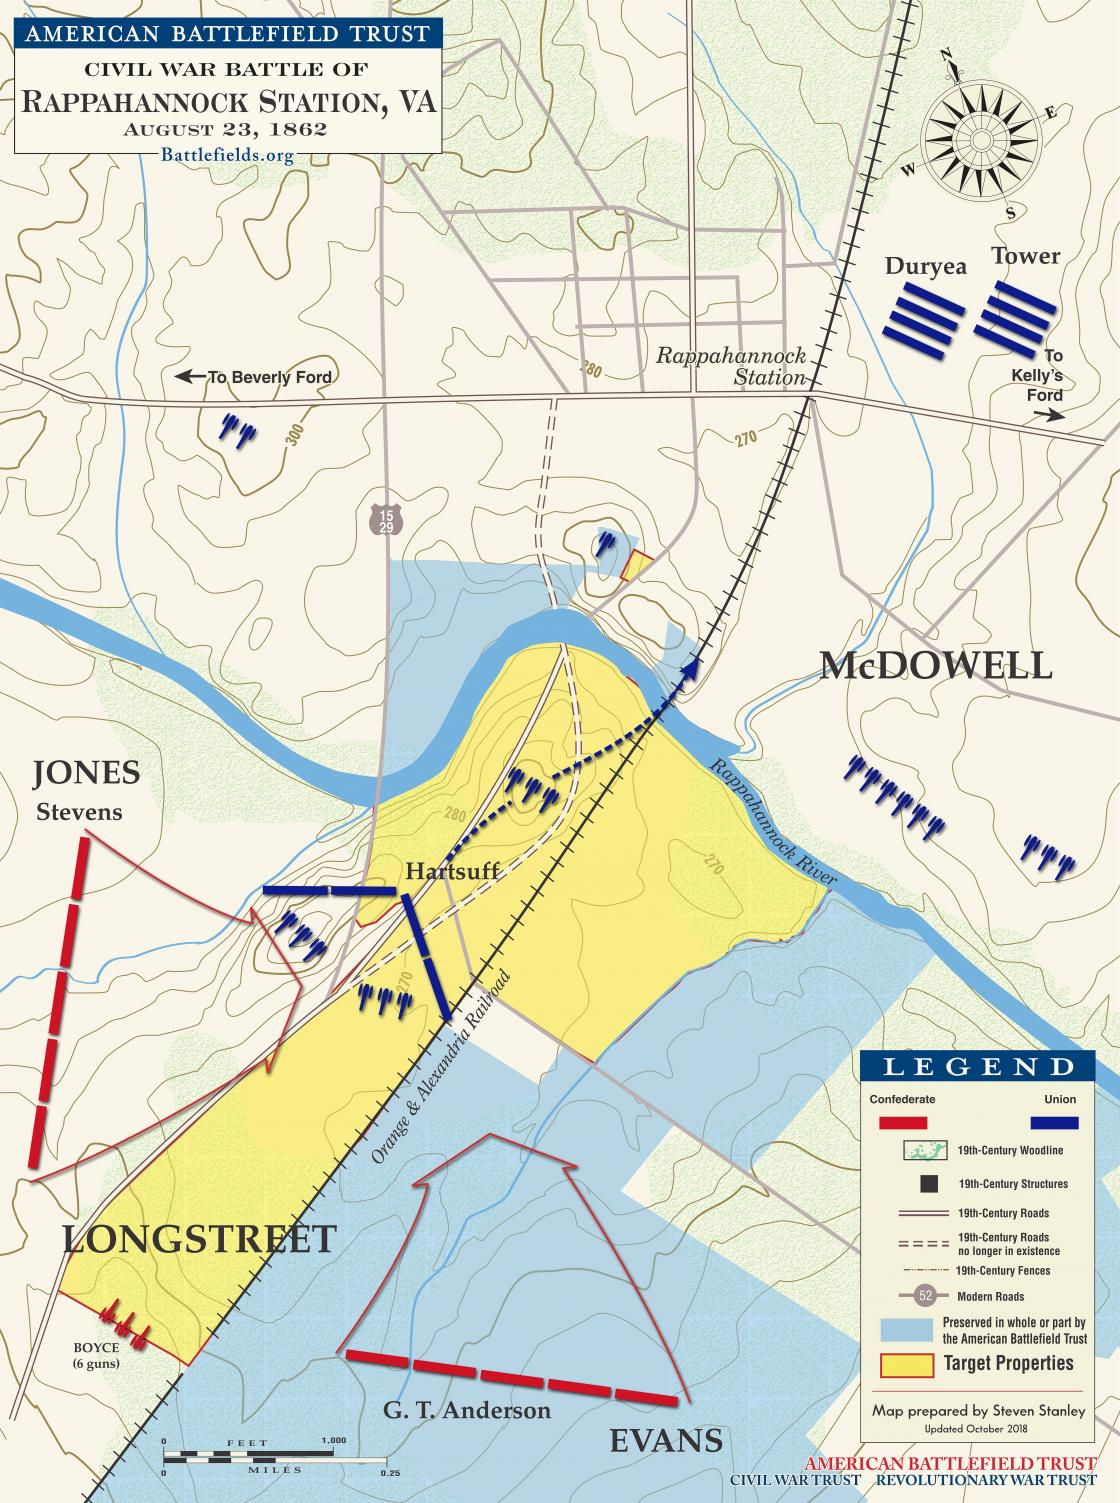 Battle of Rappahannock Station - August 22-25, 1862